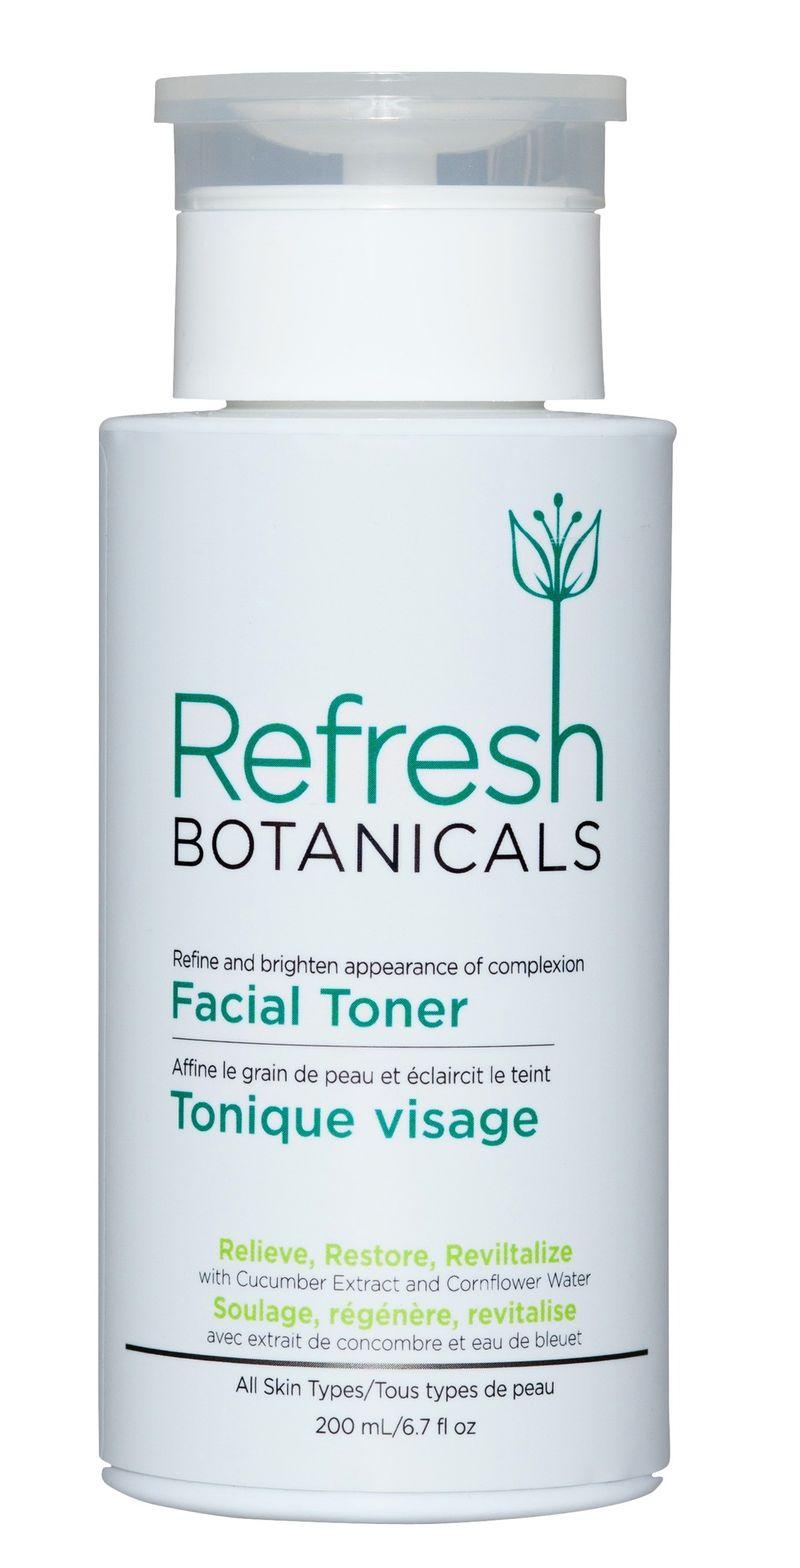 Gentle Botanical Skincare